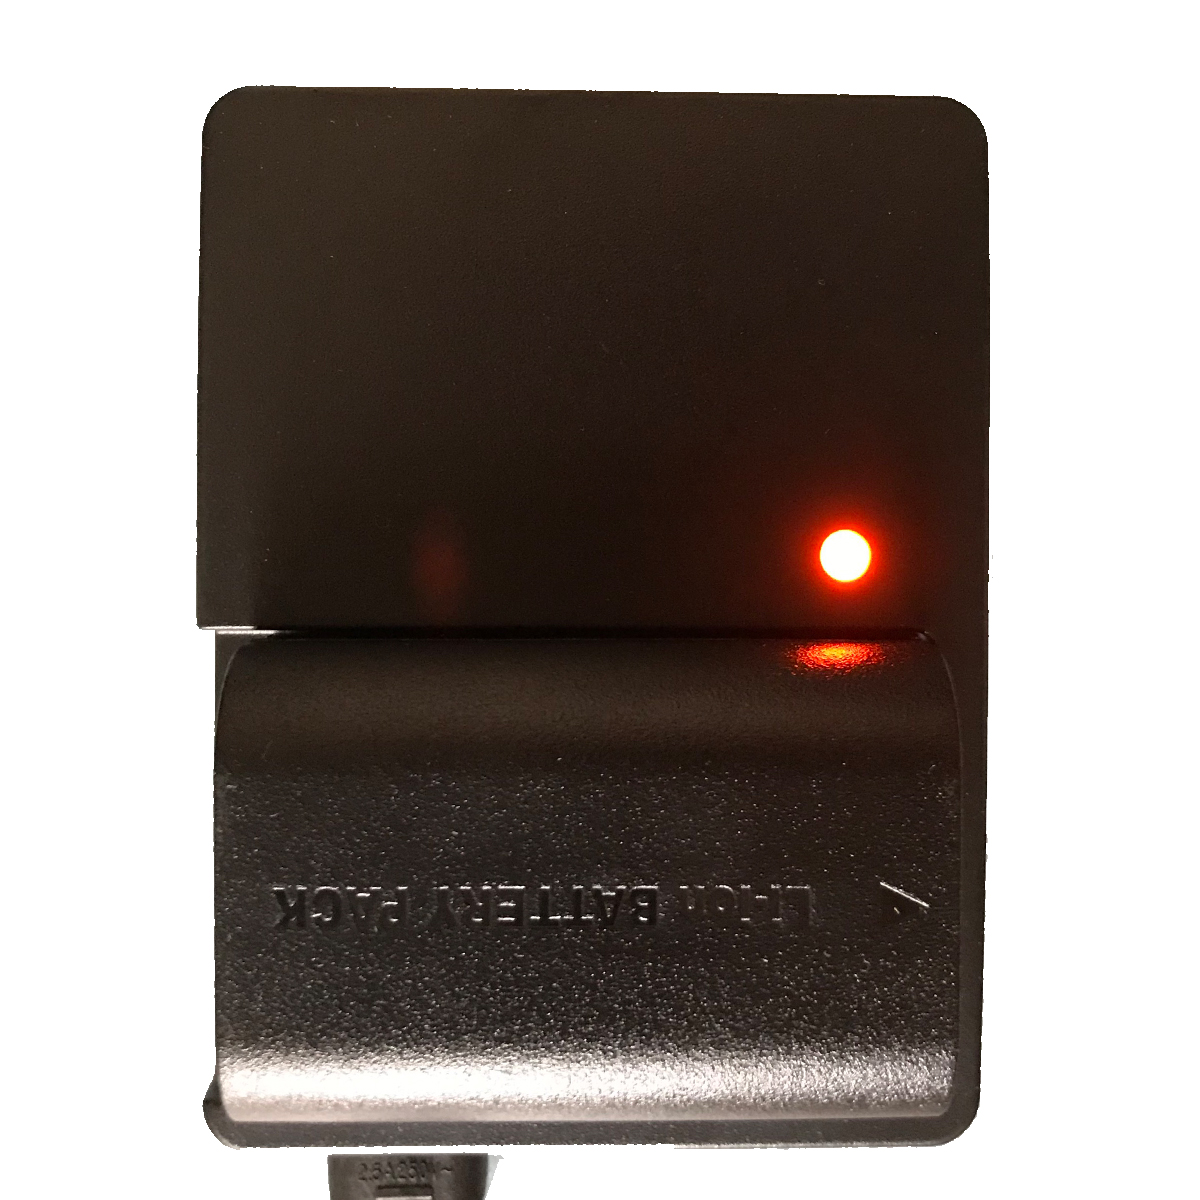 Sạc pin for Canon LP-E6 tự ngắt dành cho máy ảnh Canon 5DII , 5DIII , 6D , 7D, 70D, canon 60D